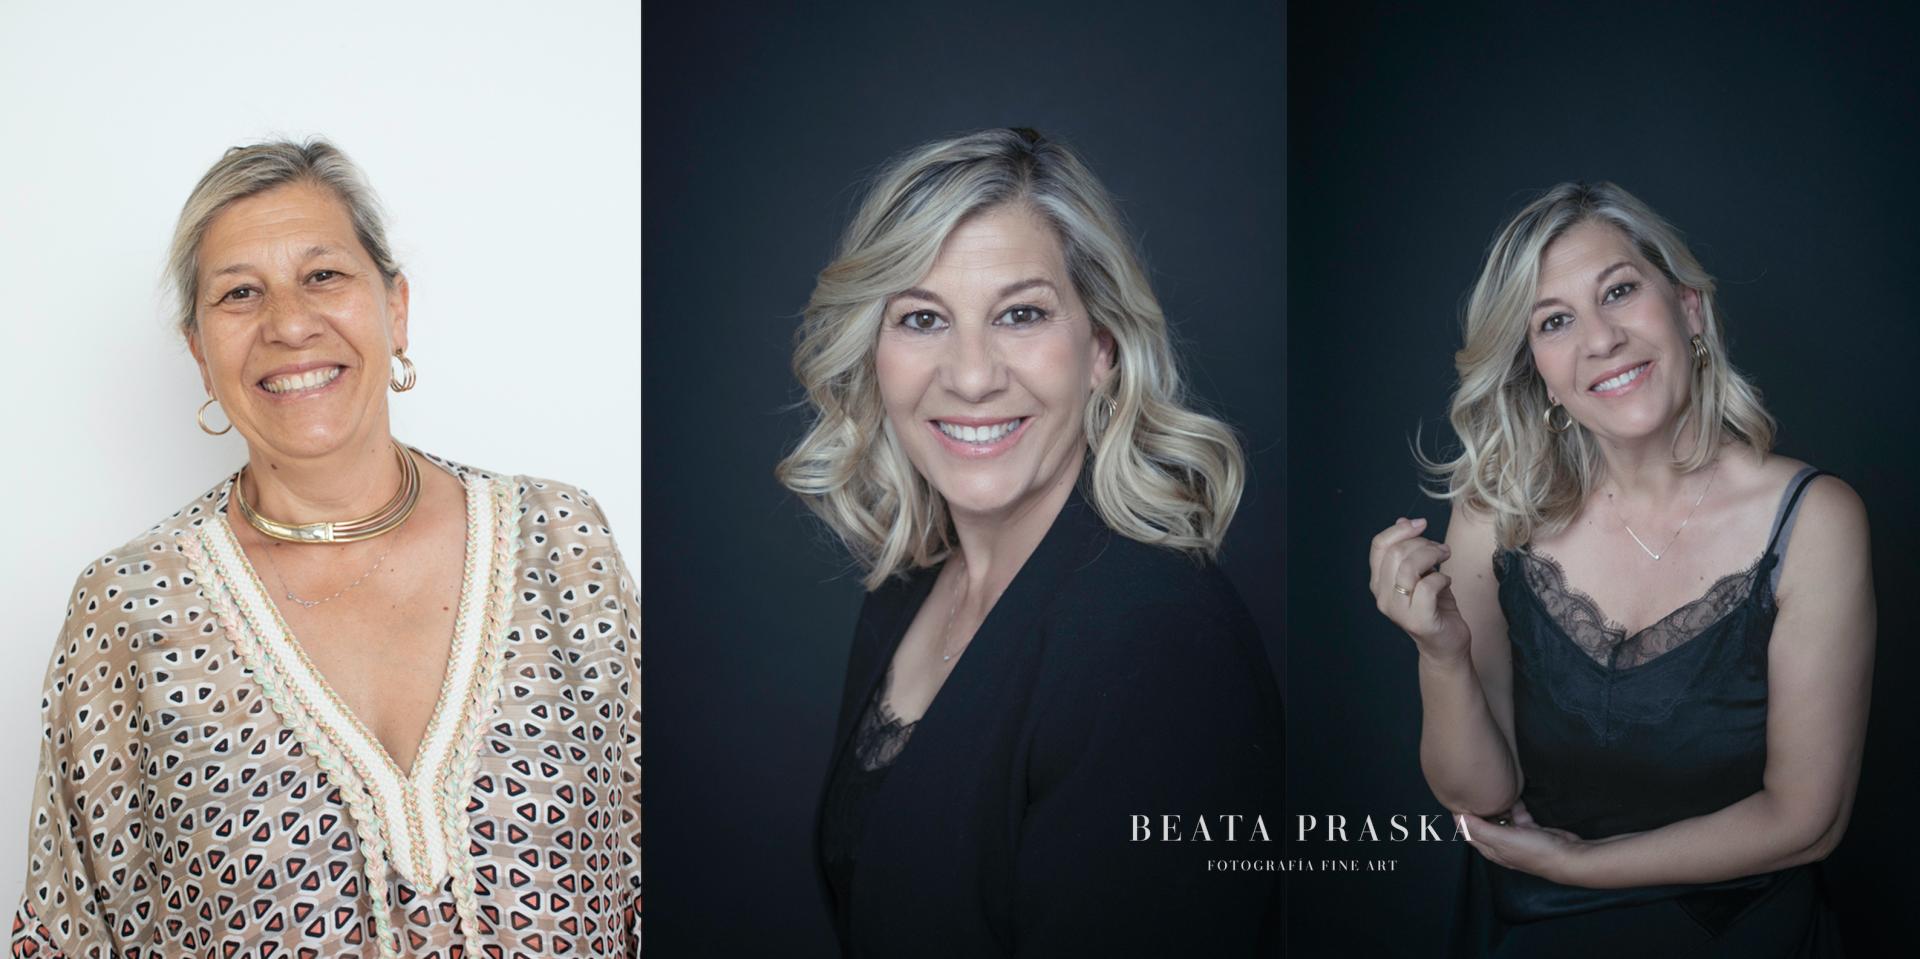 Beata Praska Fotografia a 50 mujeres de mas de 50 años